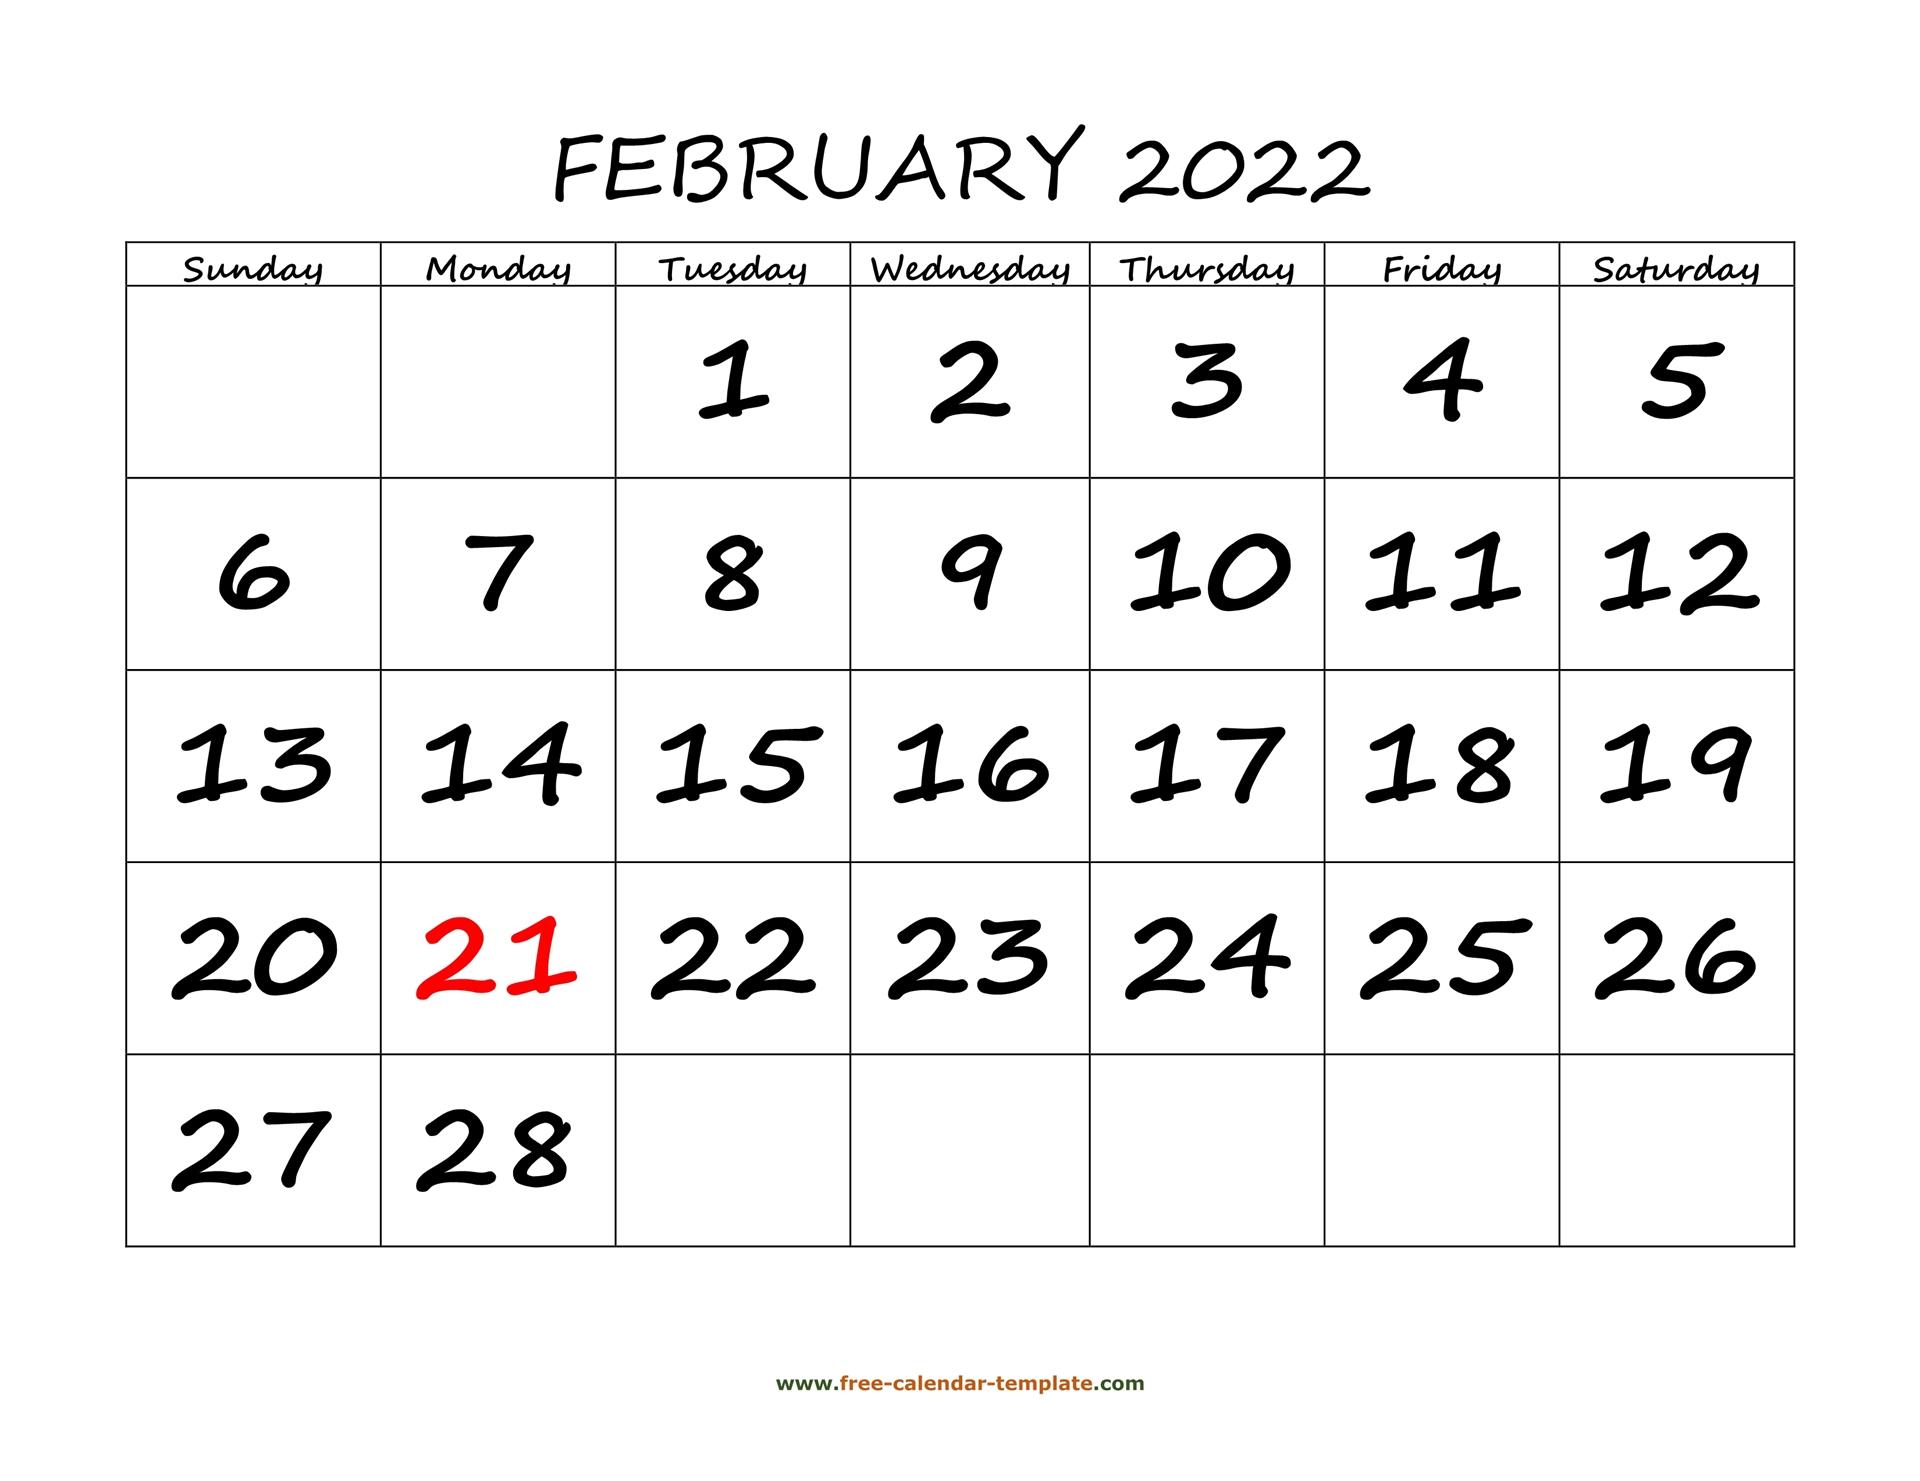 February 2022 Calendar Designed With Large Font in Calendar Print Feb 2022